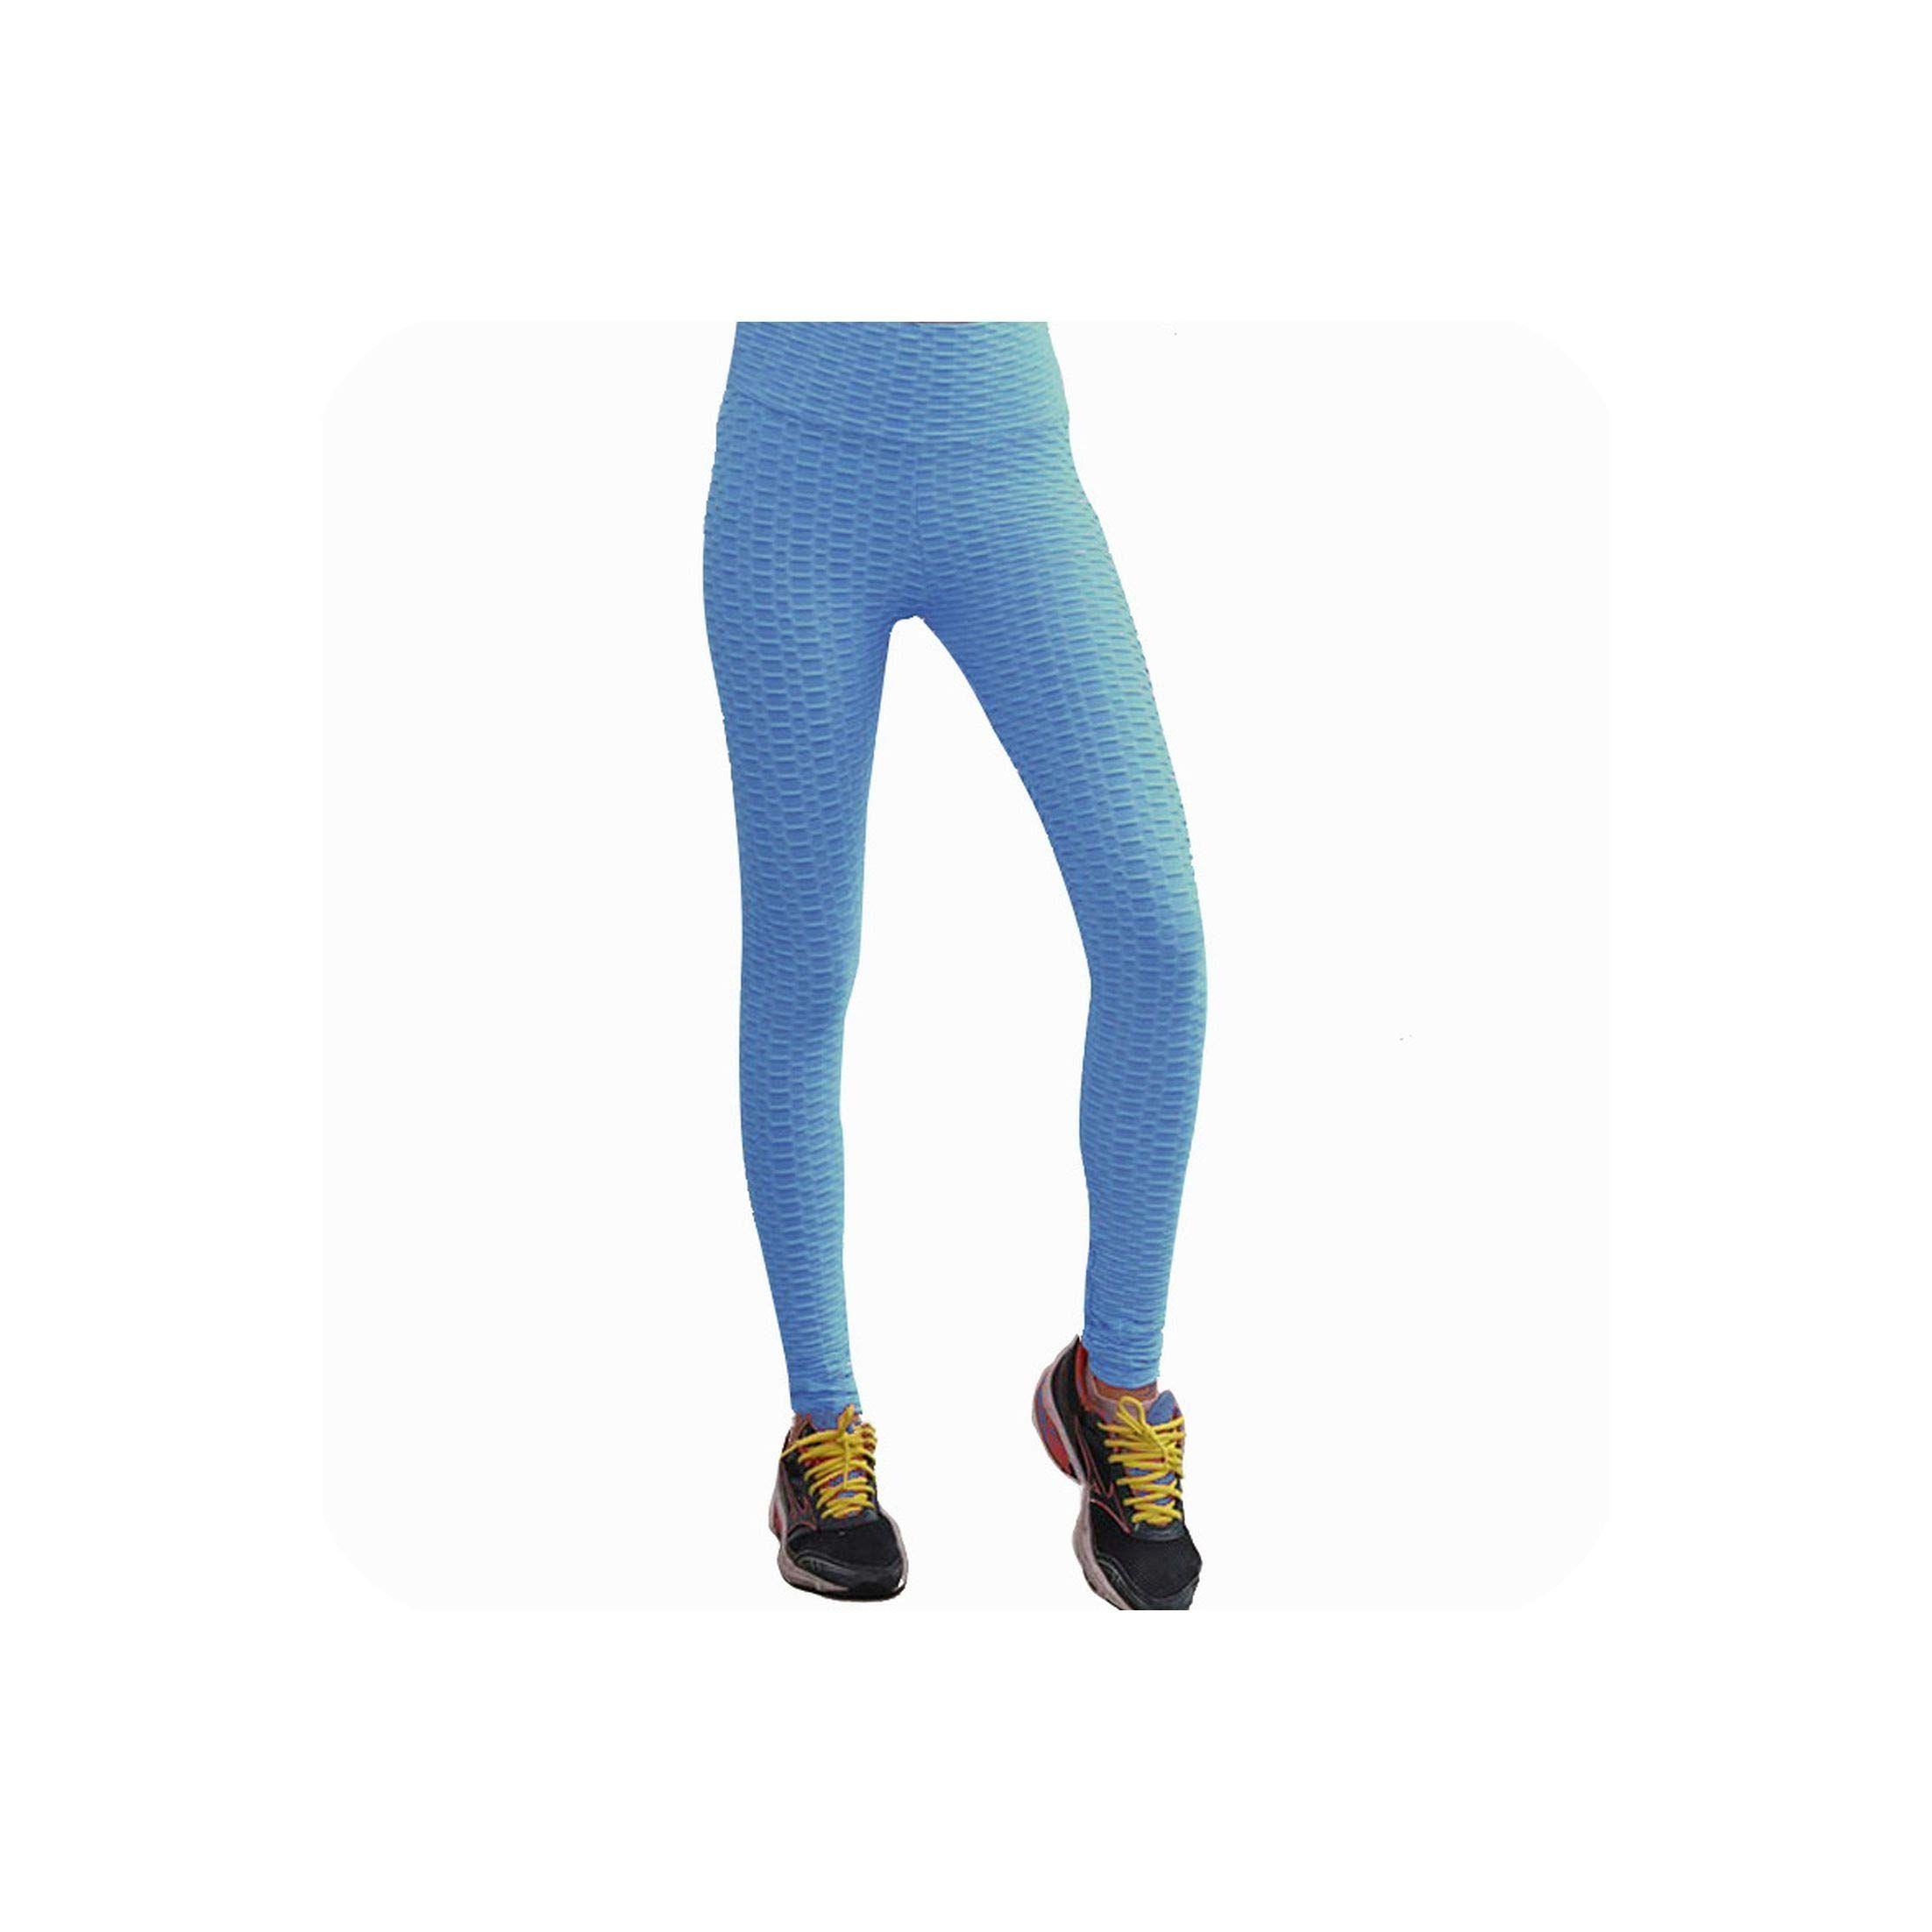 Lishfun Men Cotton Loose Work Casual Short Pants Plus Size Men Casual Elastic Solid Pockets Trousers #503,Dark Gray,L,China